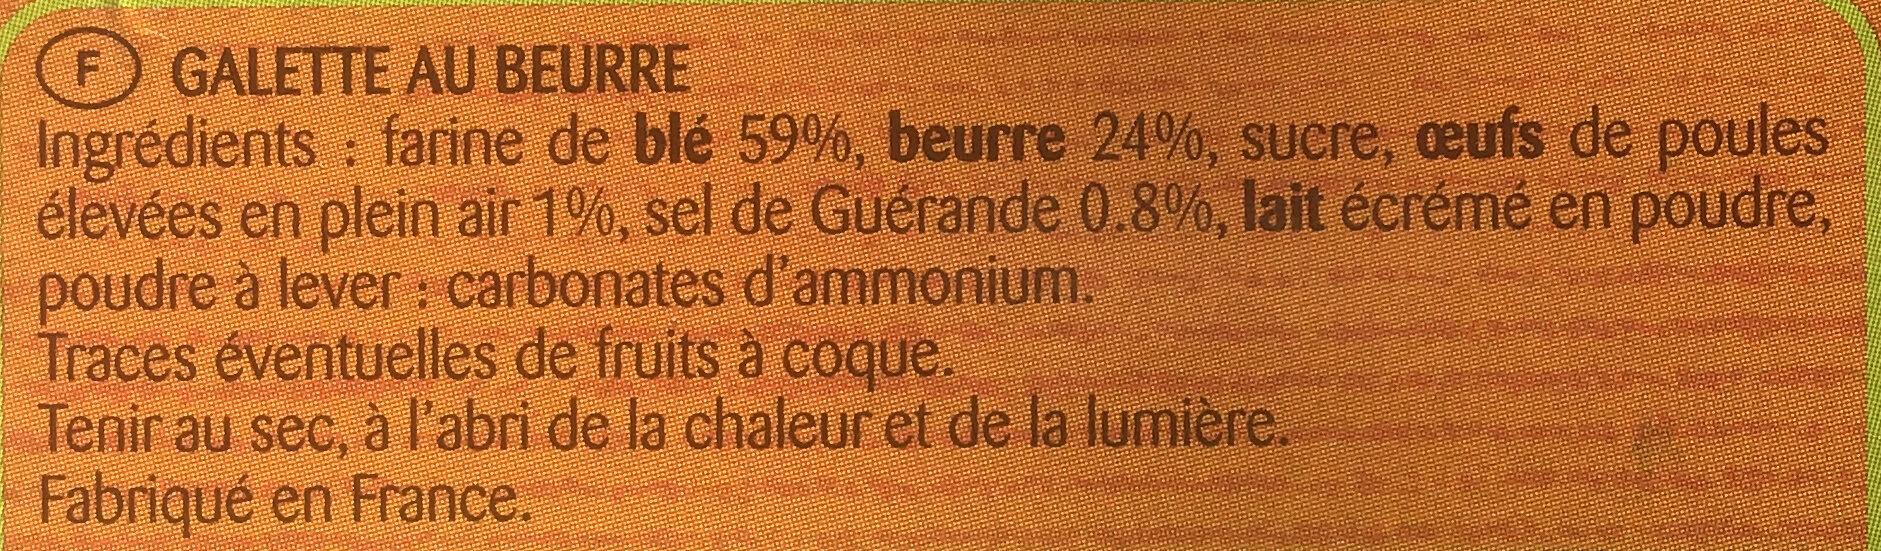 La Grande Galette 1905 - Ingredienti - fr